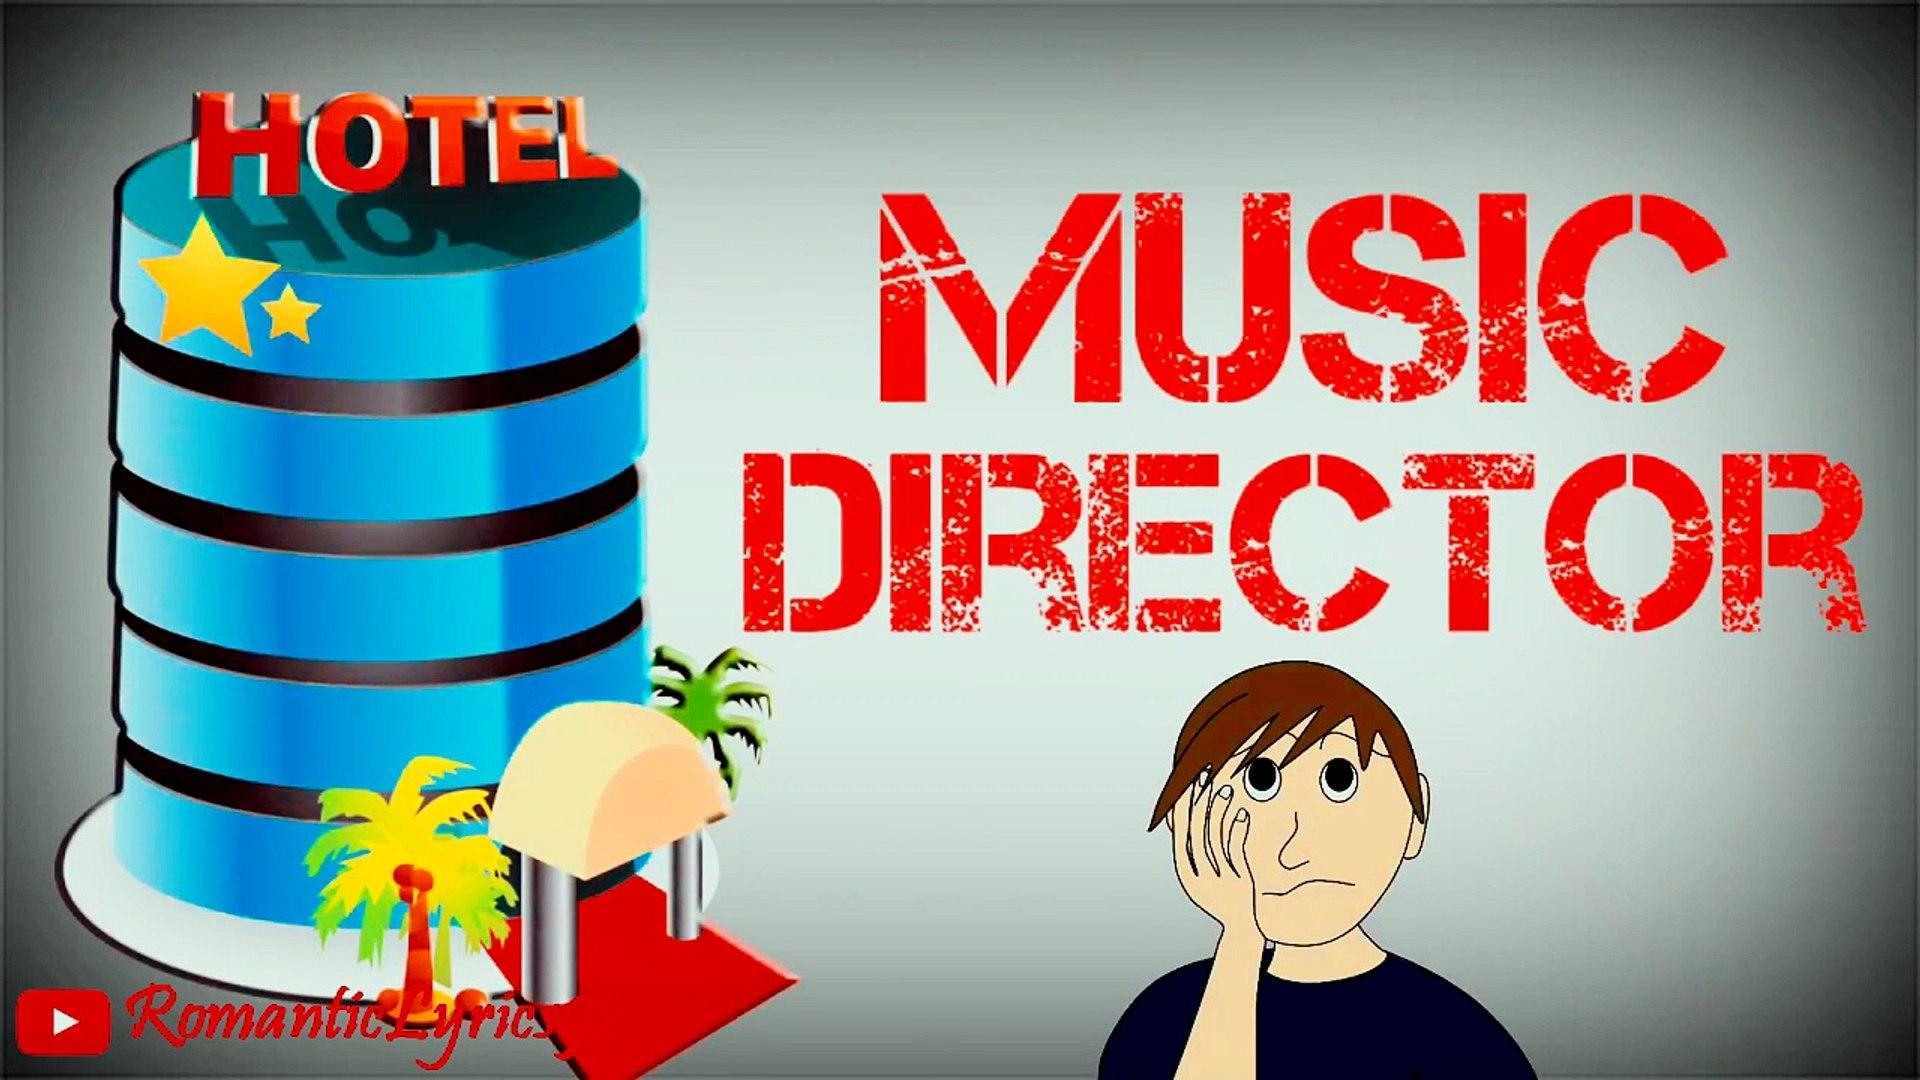 Kisey kehte hain Hip-Hop Hip-Hop Shuru kiya maine as a music director Aaj mere yaar dost bade-bade a